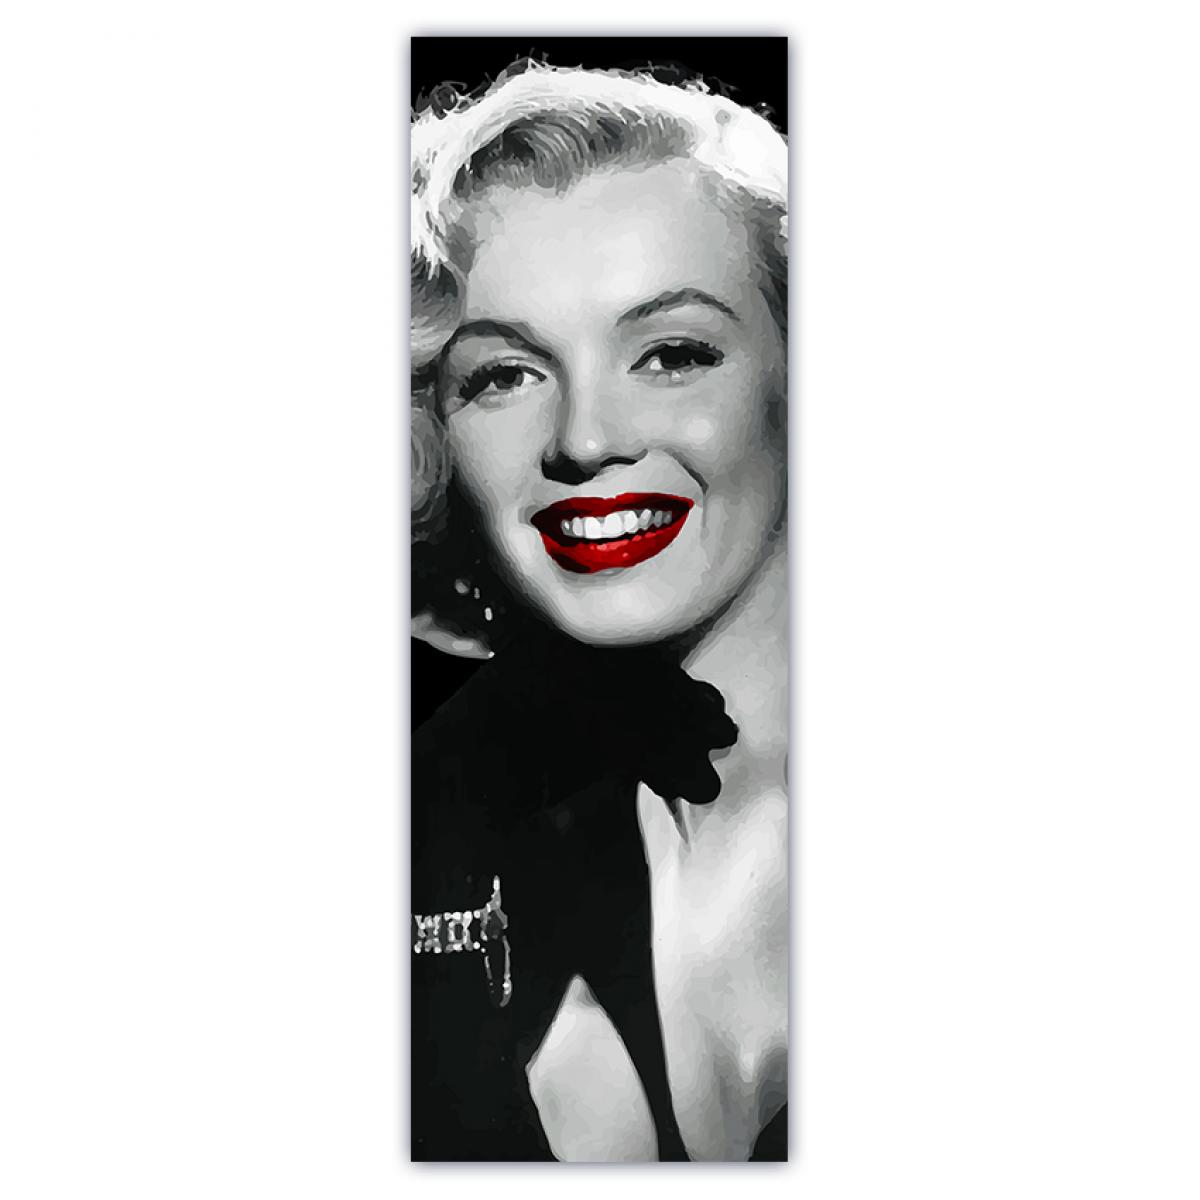 Quadri su tela | Marilyn Monroe stampe | LivingDECO\'